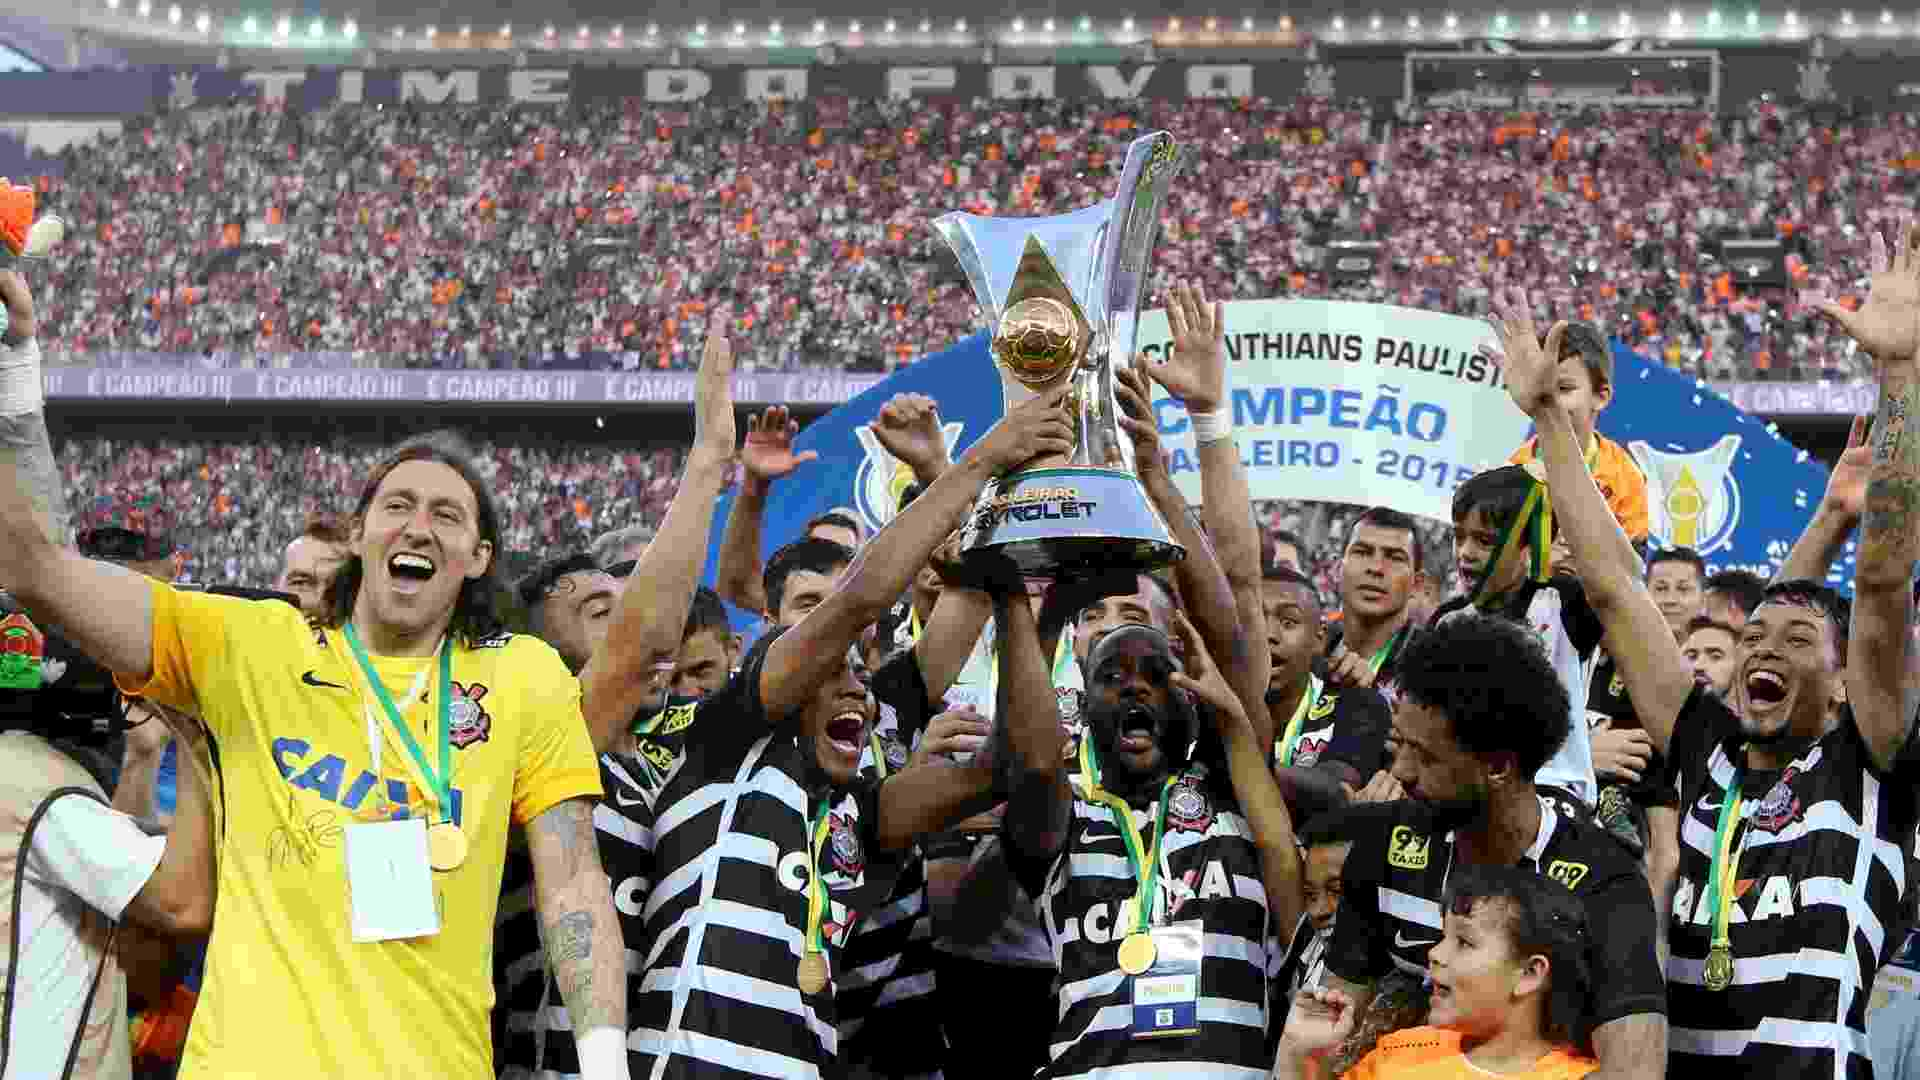 Corinthians levanta taça do Campeonato Brasileiro após golear o São Paulo - REUTERS/Paulo Whitaker